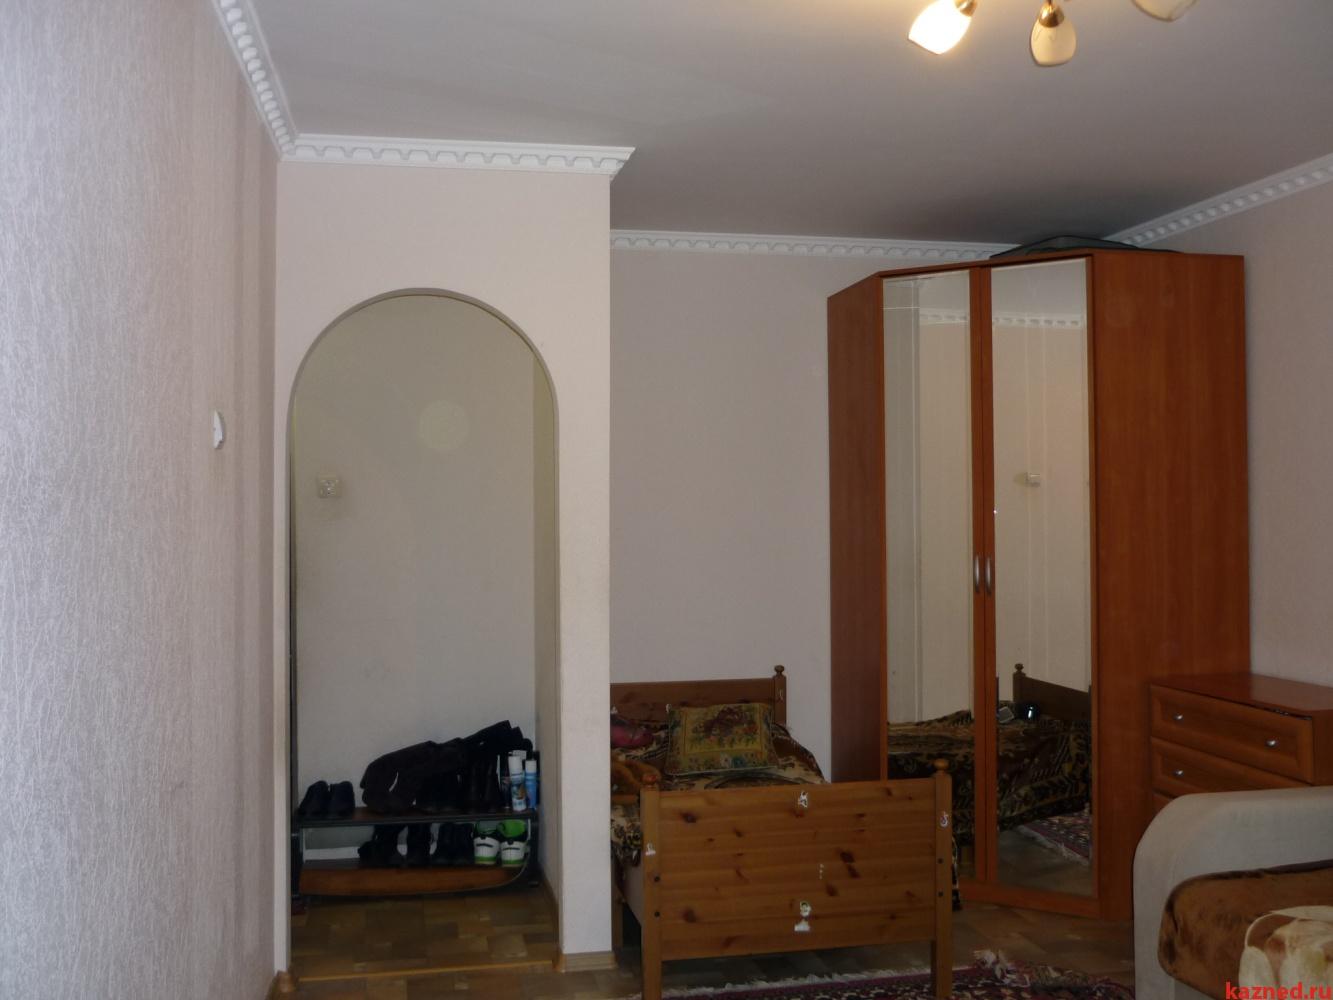 Продажа 1-к квартиры Фатыха Амирхана д.53б, 38 м² (миниатюра №5)